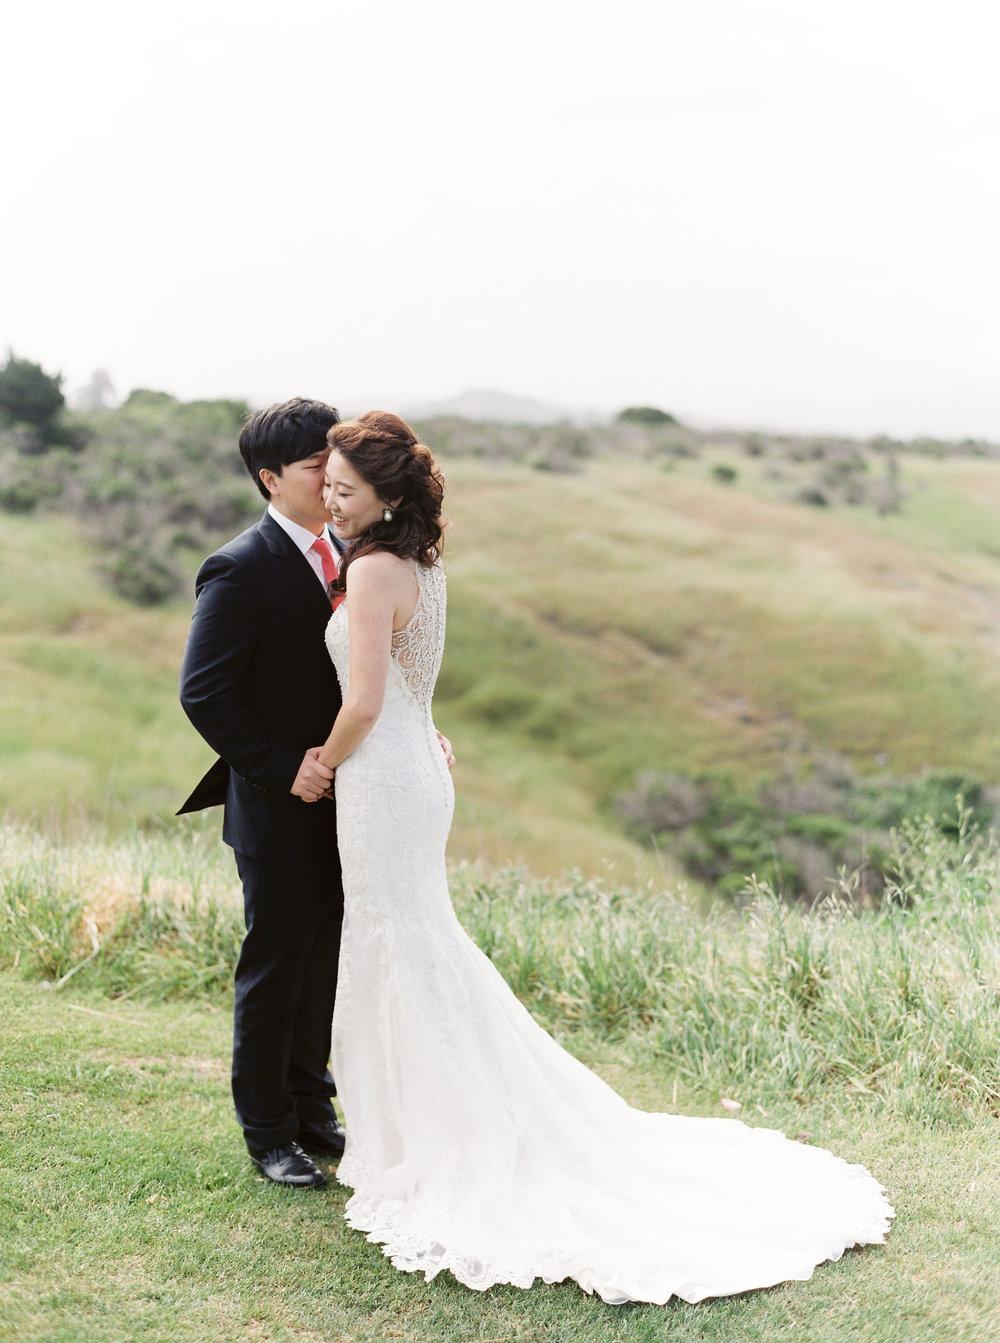 mountaintop-wedding-at-crystal-springs-burlingame-california-31.jpg